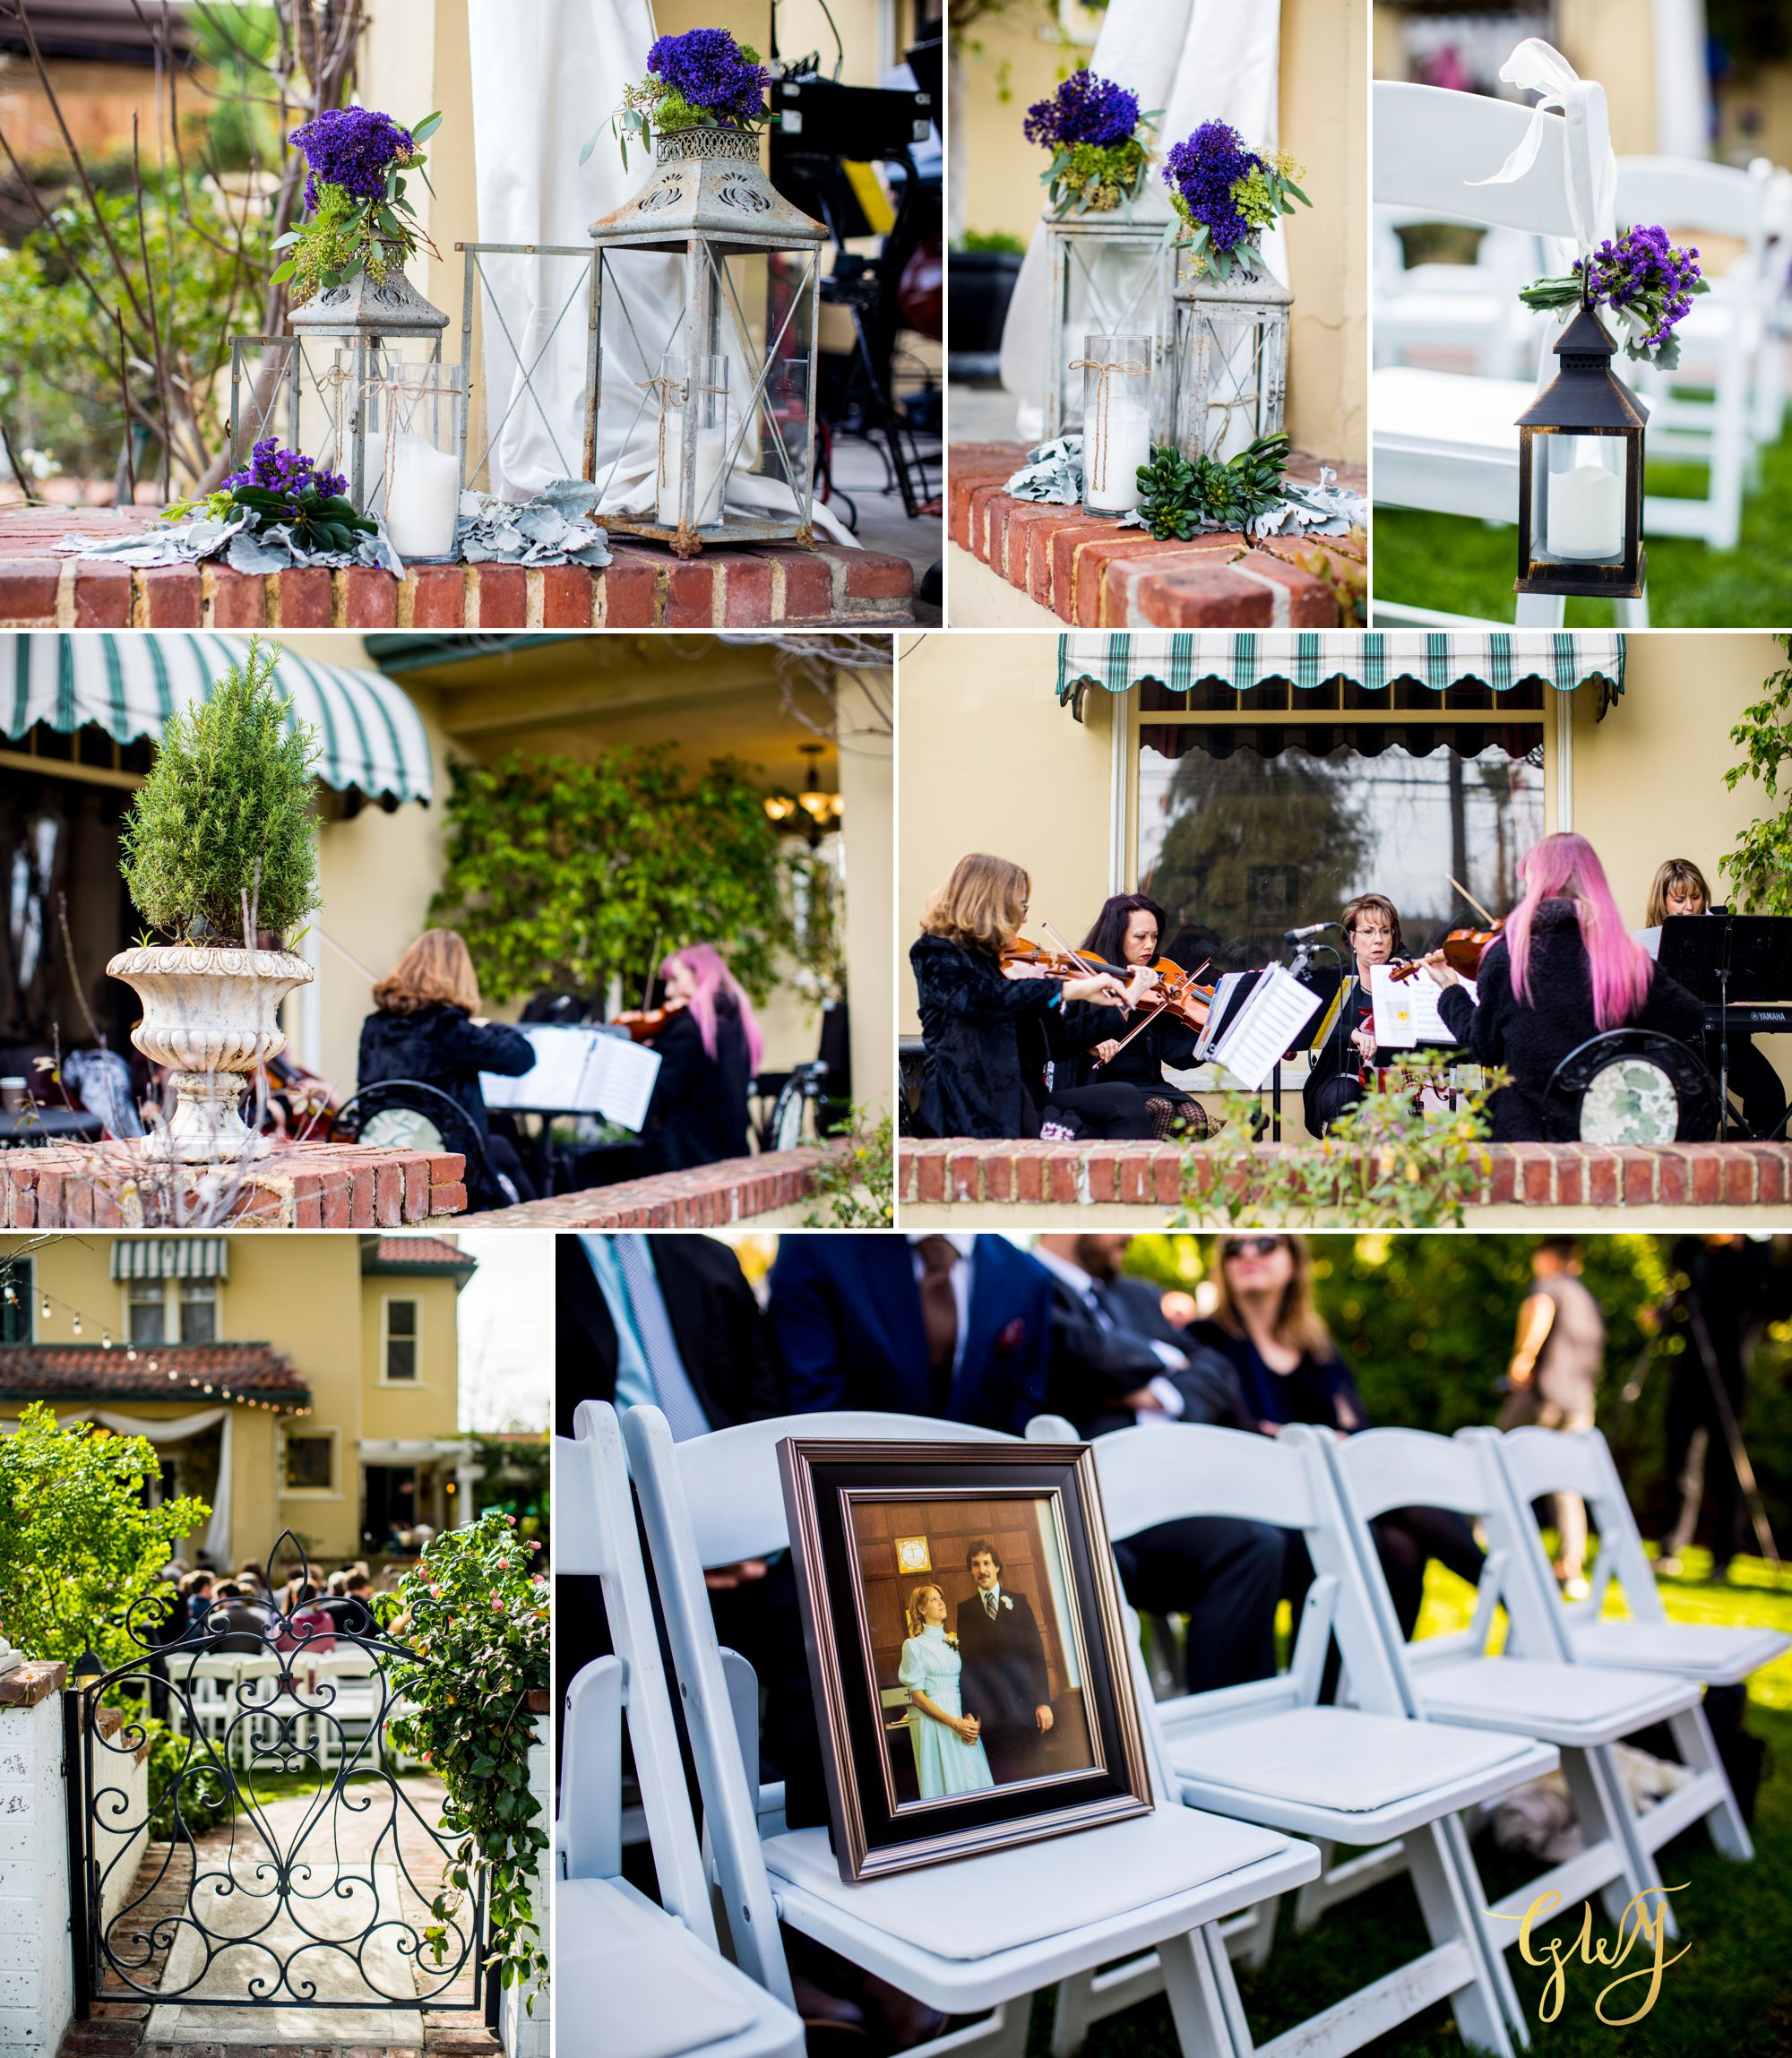 Garrett + Michelle's French Estate Orange County Spring Wedding by Glass Woods Media 21.jpg